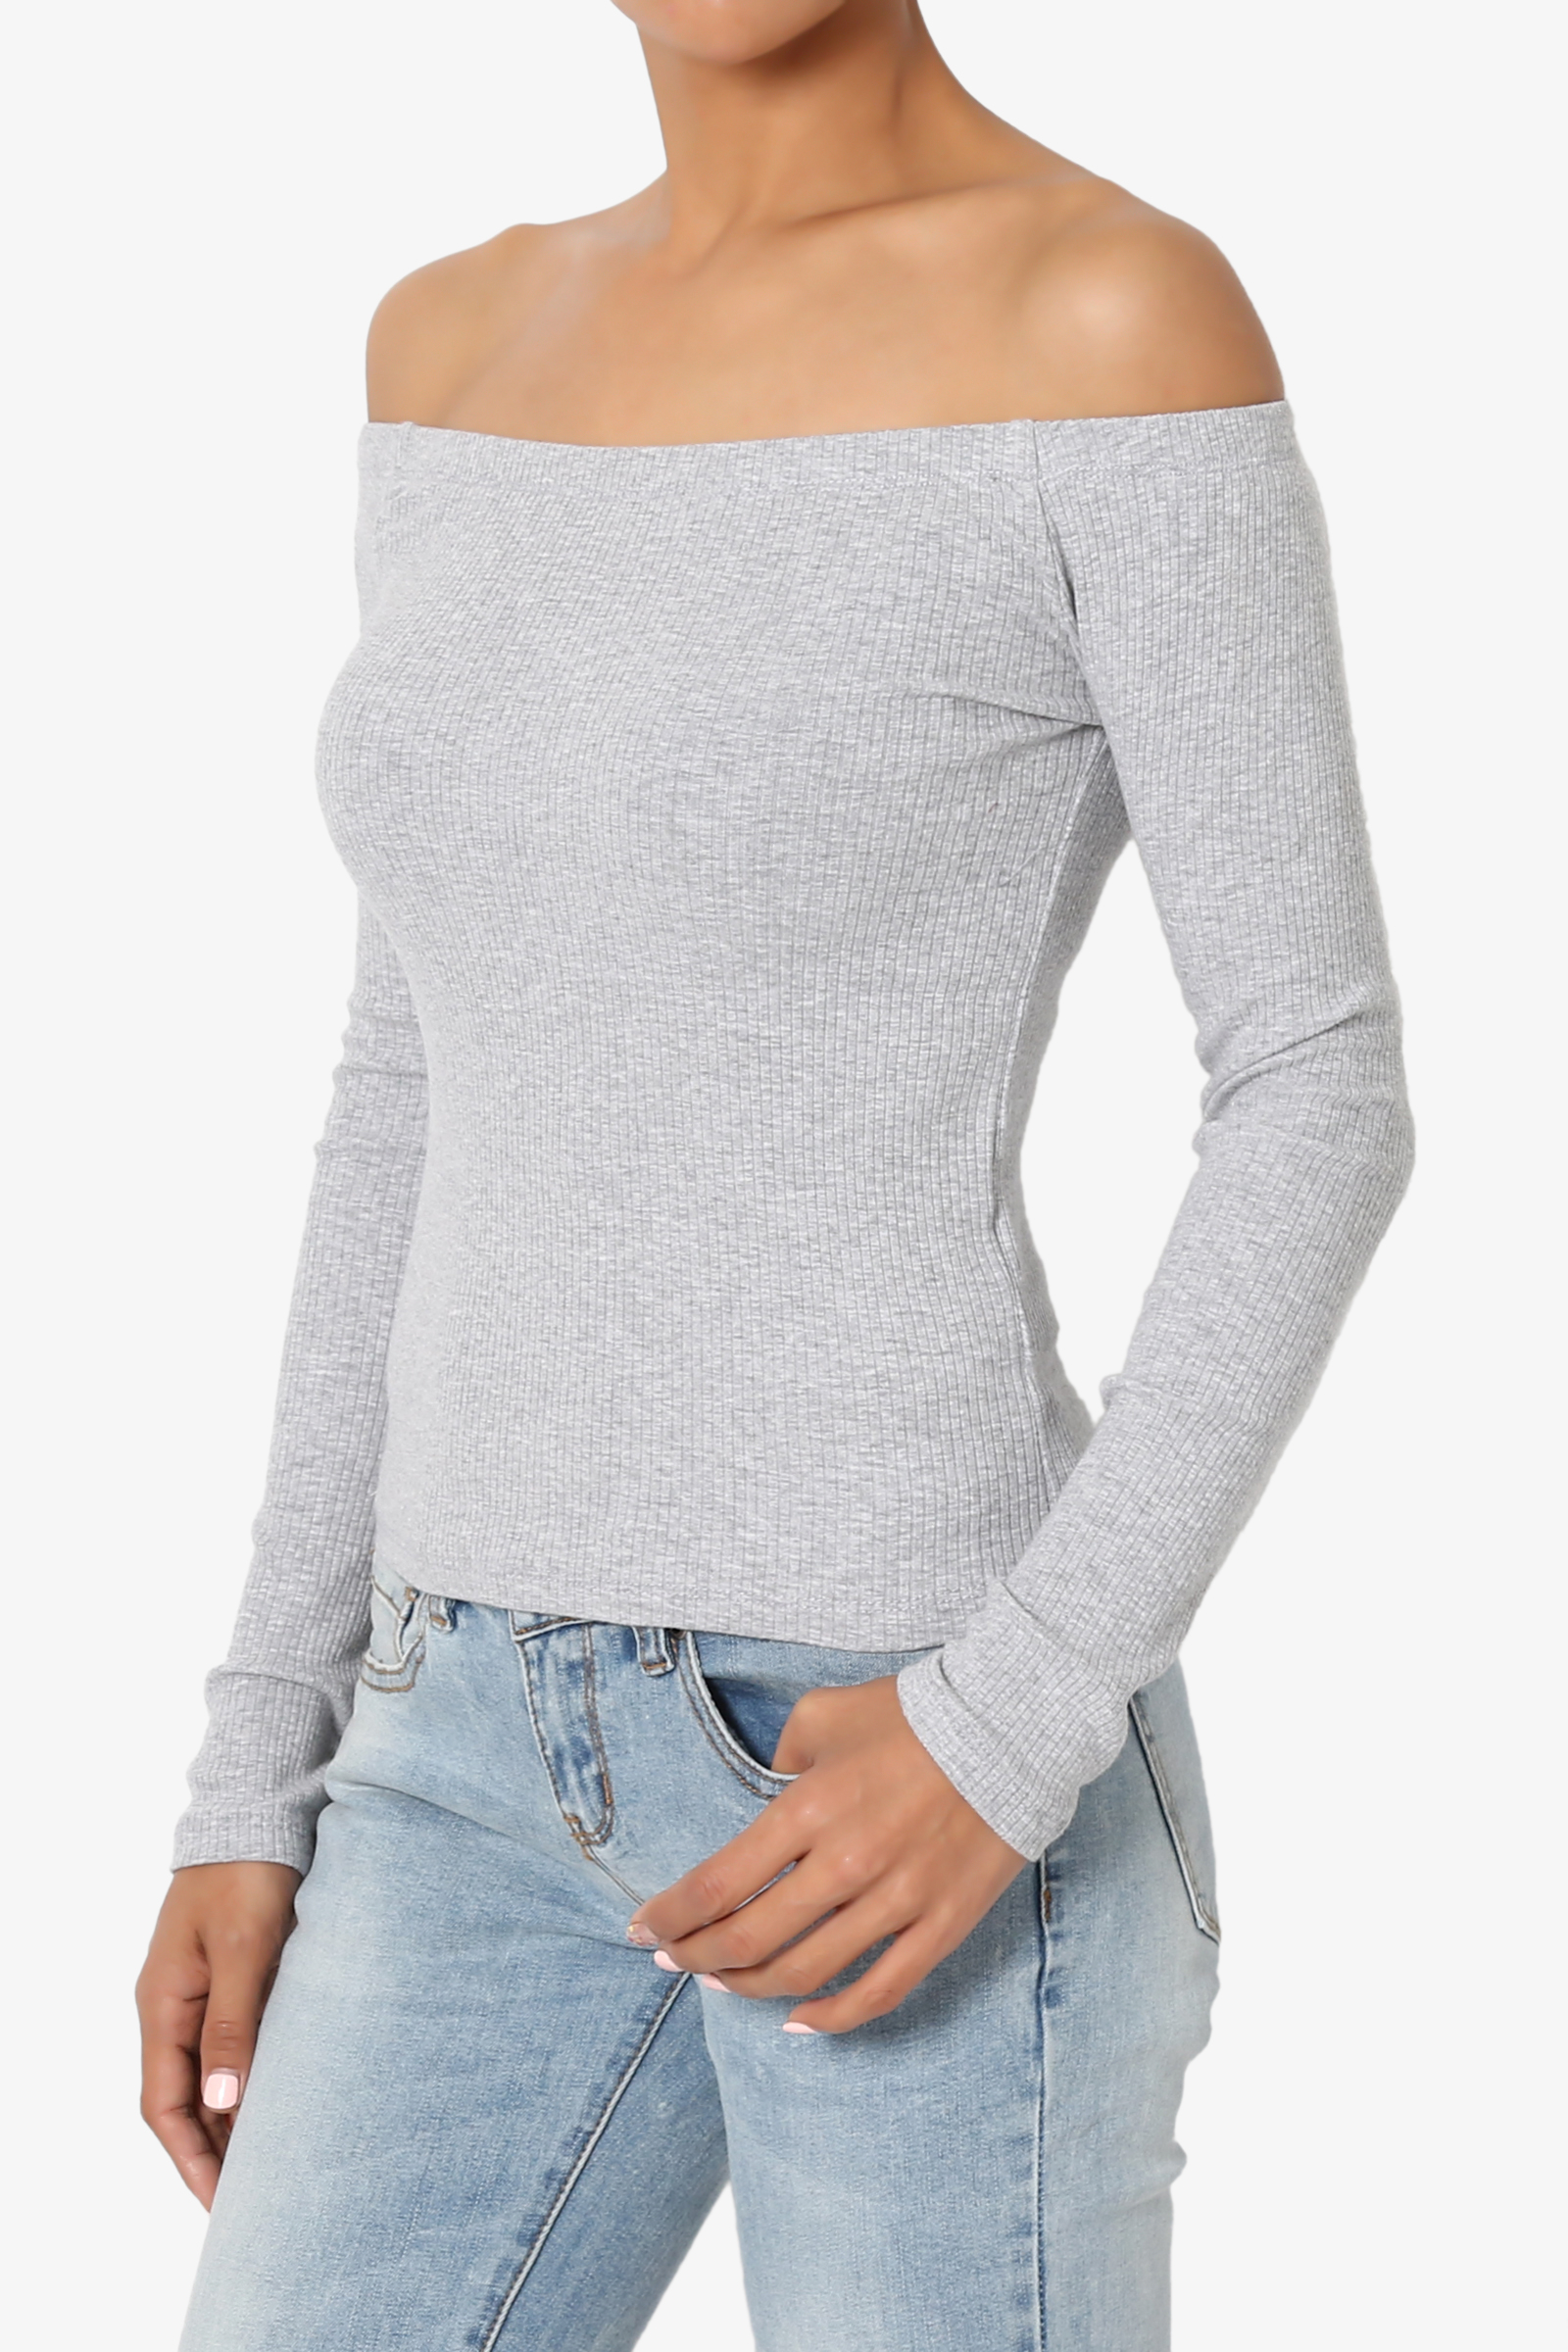 cfb38d593cdac TheMogan Junior s Off Shoulder Long Sleeve Stretch Ribbed Cotton Jersey Top  - Walmart.com